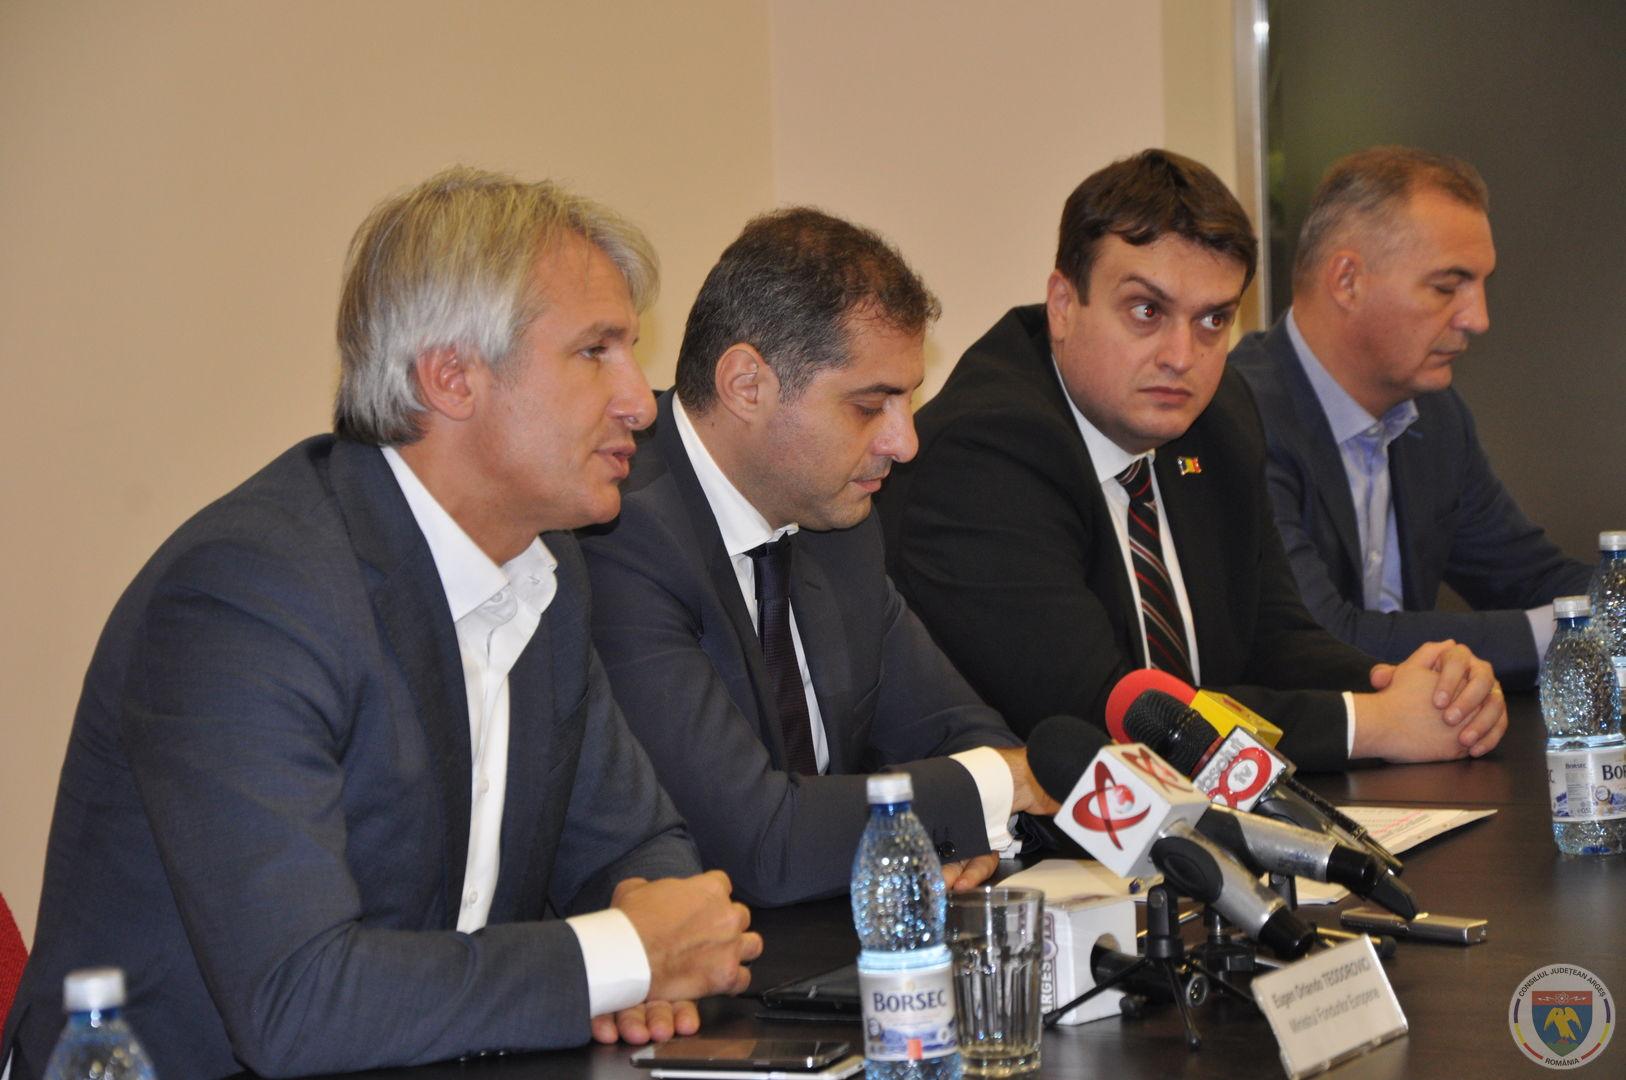 Conferinta Ministrii Teodorovici & Jianu 11.11.2014 (8).JPG